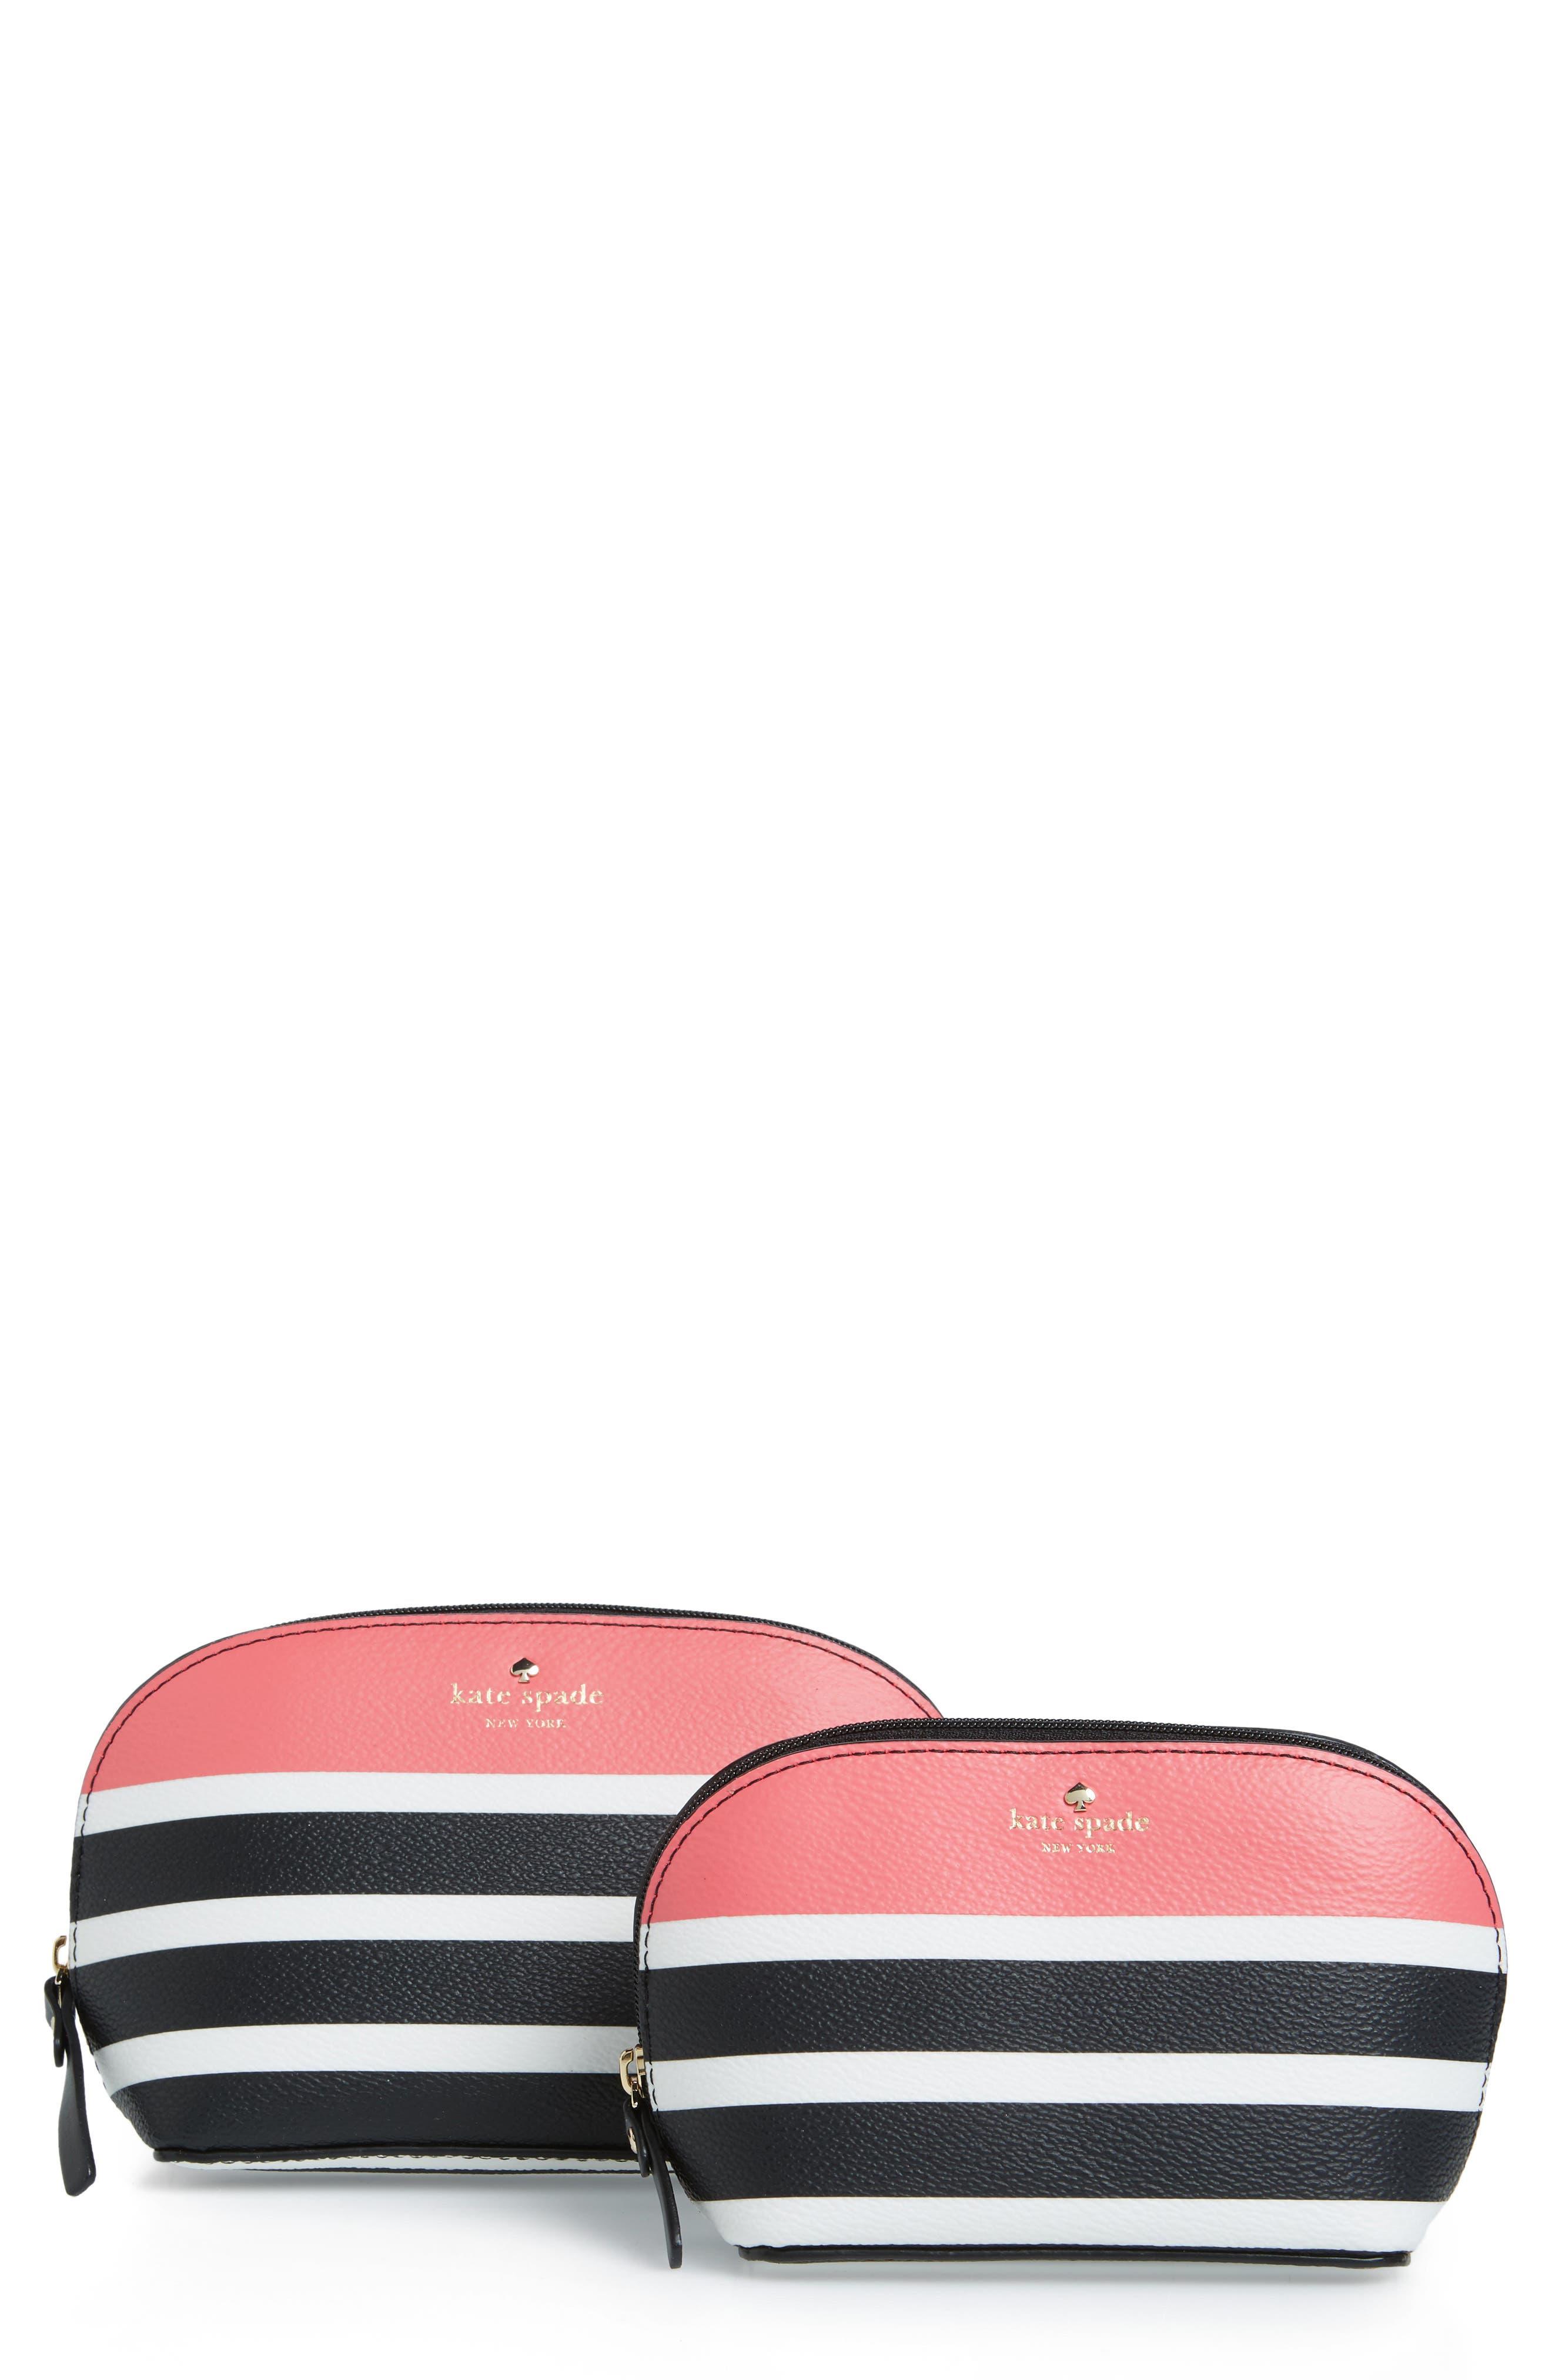 hyde lane stripe abalene set of 2 faux leather pouches,                         Main,                         color, 001